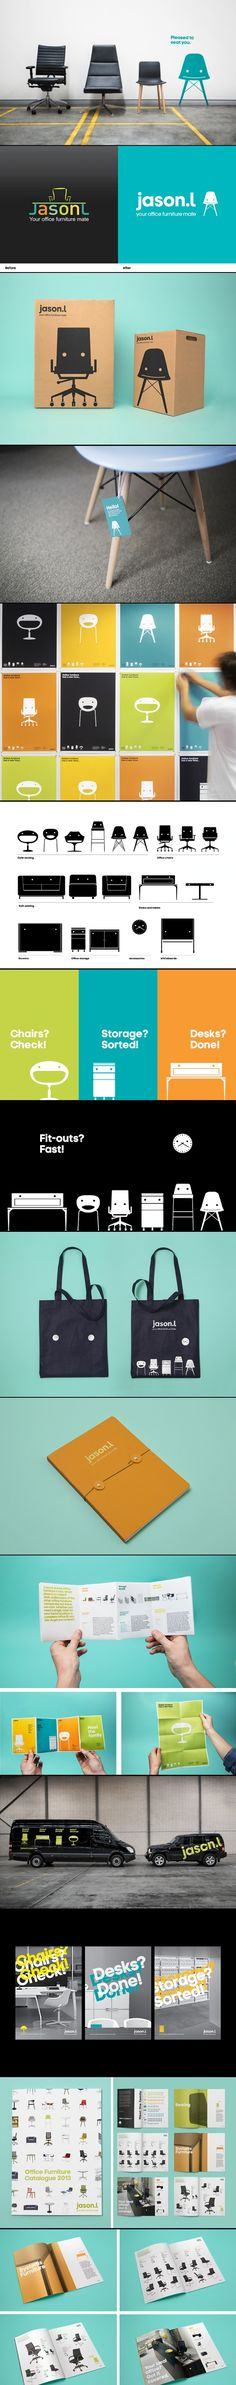 Branding #design #id